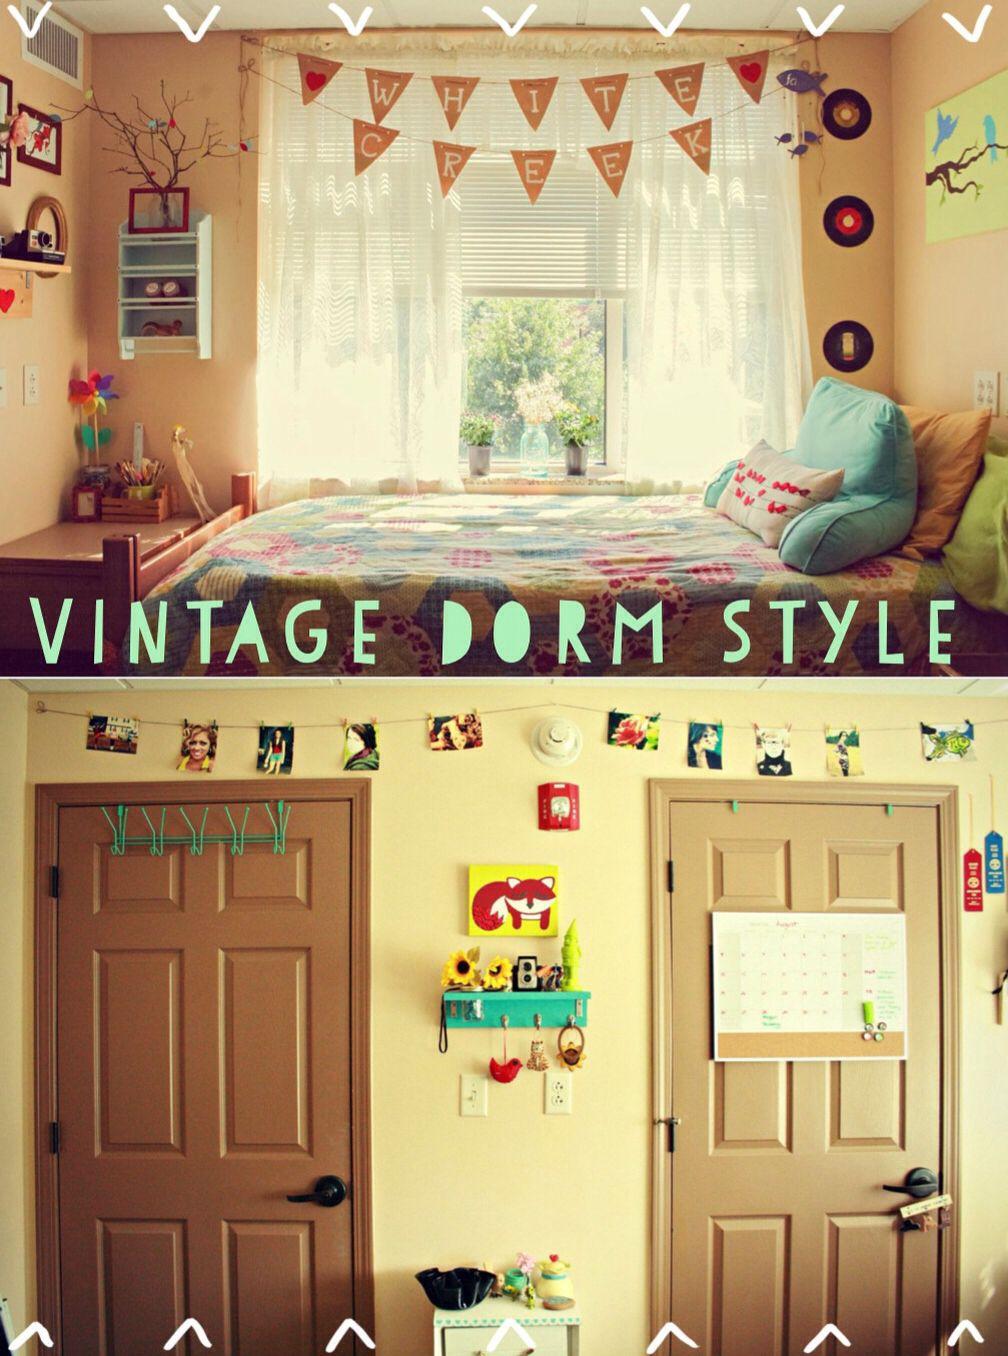 vintage dorm style #dorm #dormdecor #college #decor #vintage